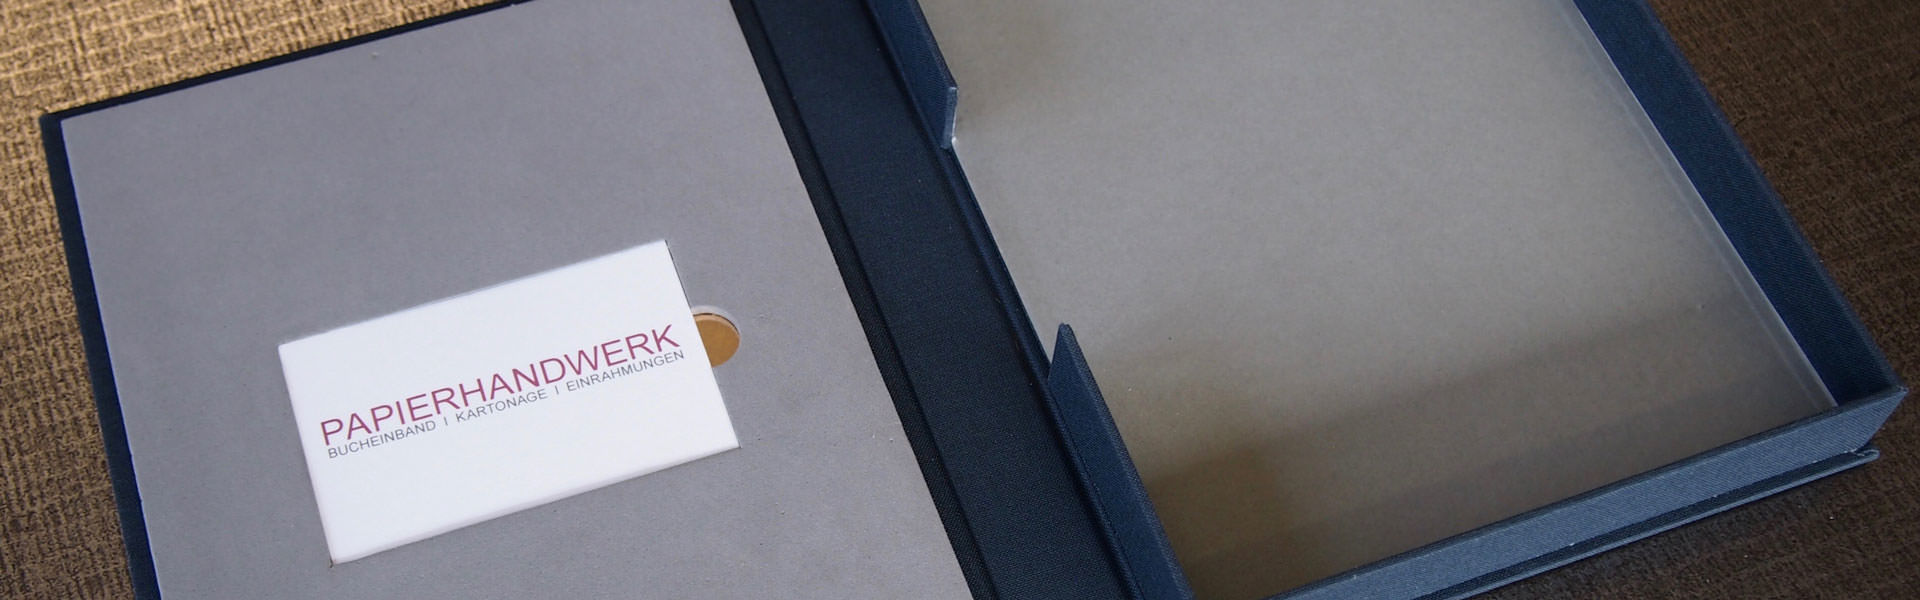 Klappschachtel - Buchbinderei Papierhandwerk